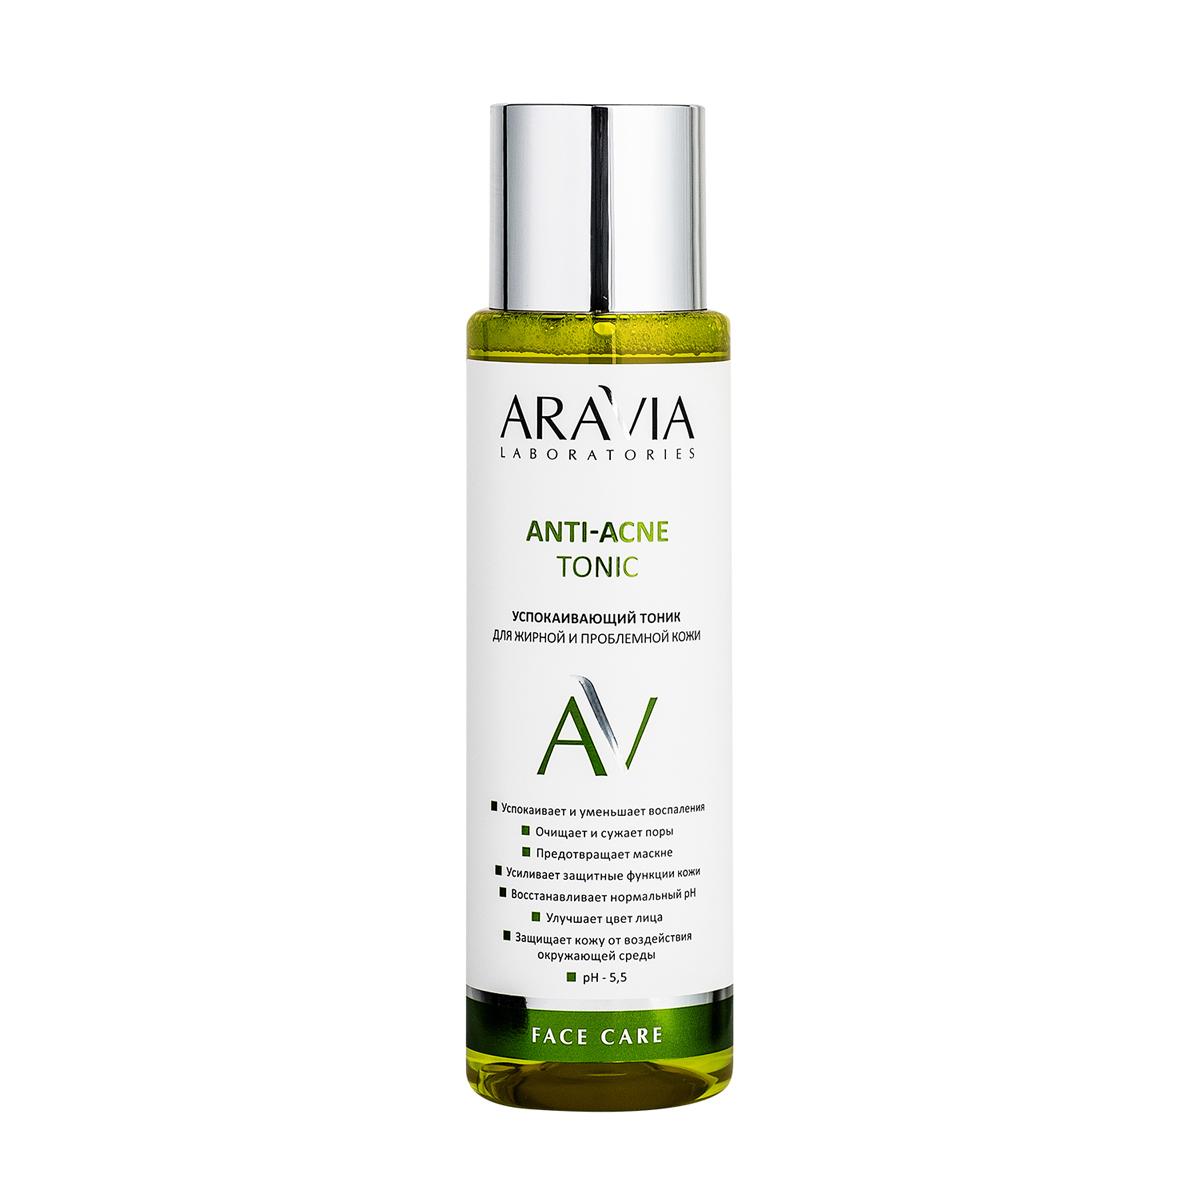 Aravia Laboratories Успокаивающий тоник для жирной и проблемной кожи Anti-Acne Tonic, 250 мл (Aravia Laboratories, Уход за лицом)